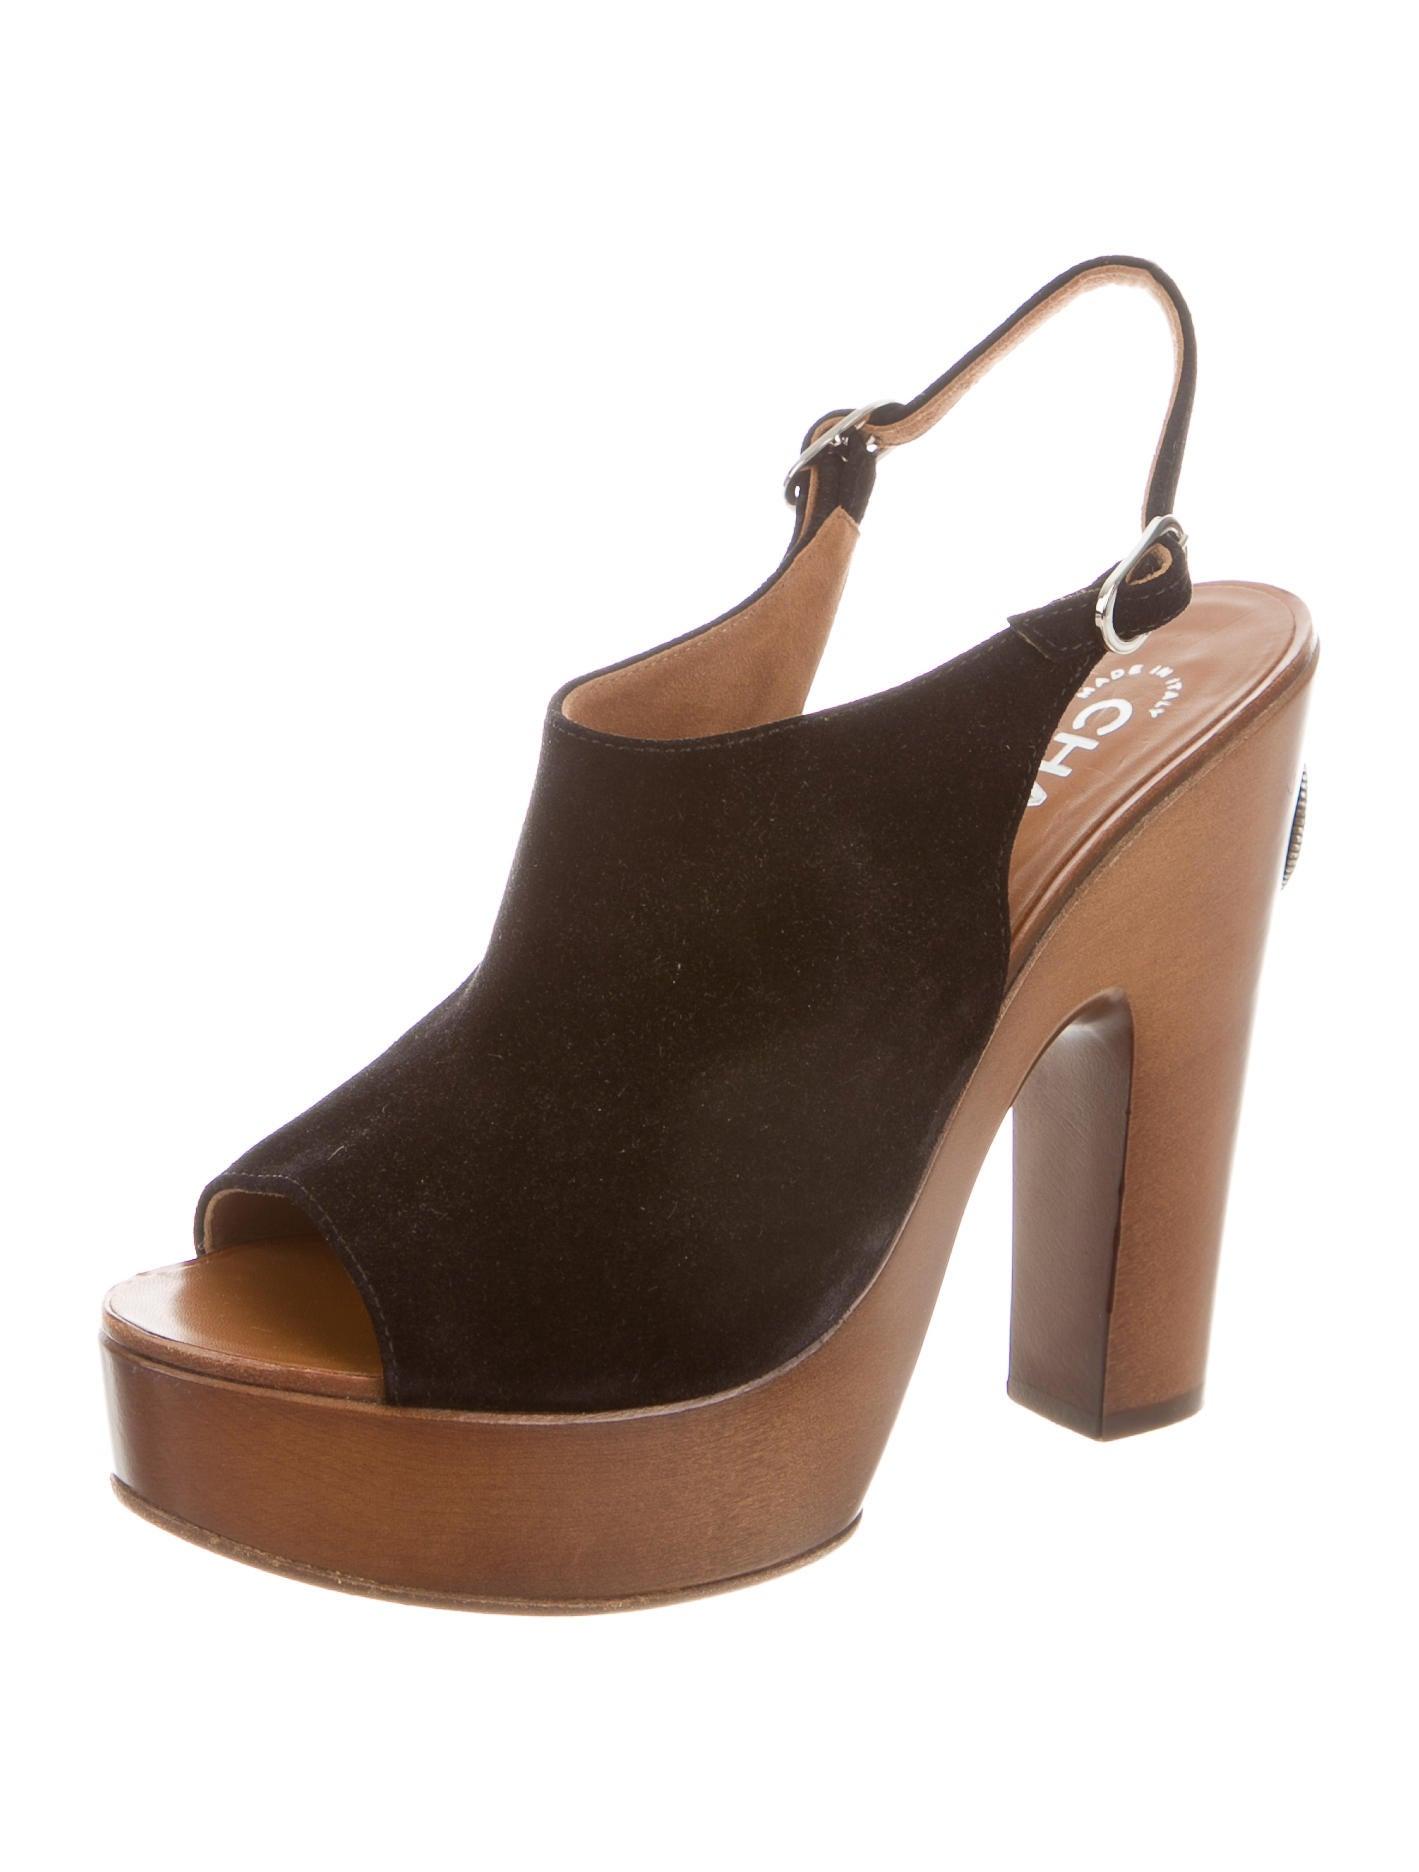 chanel suede platform sandals shoes cha125027 the